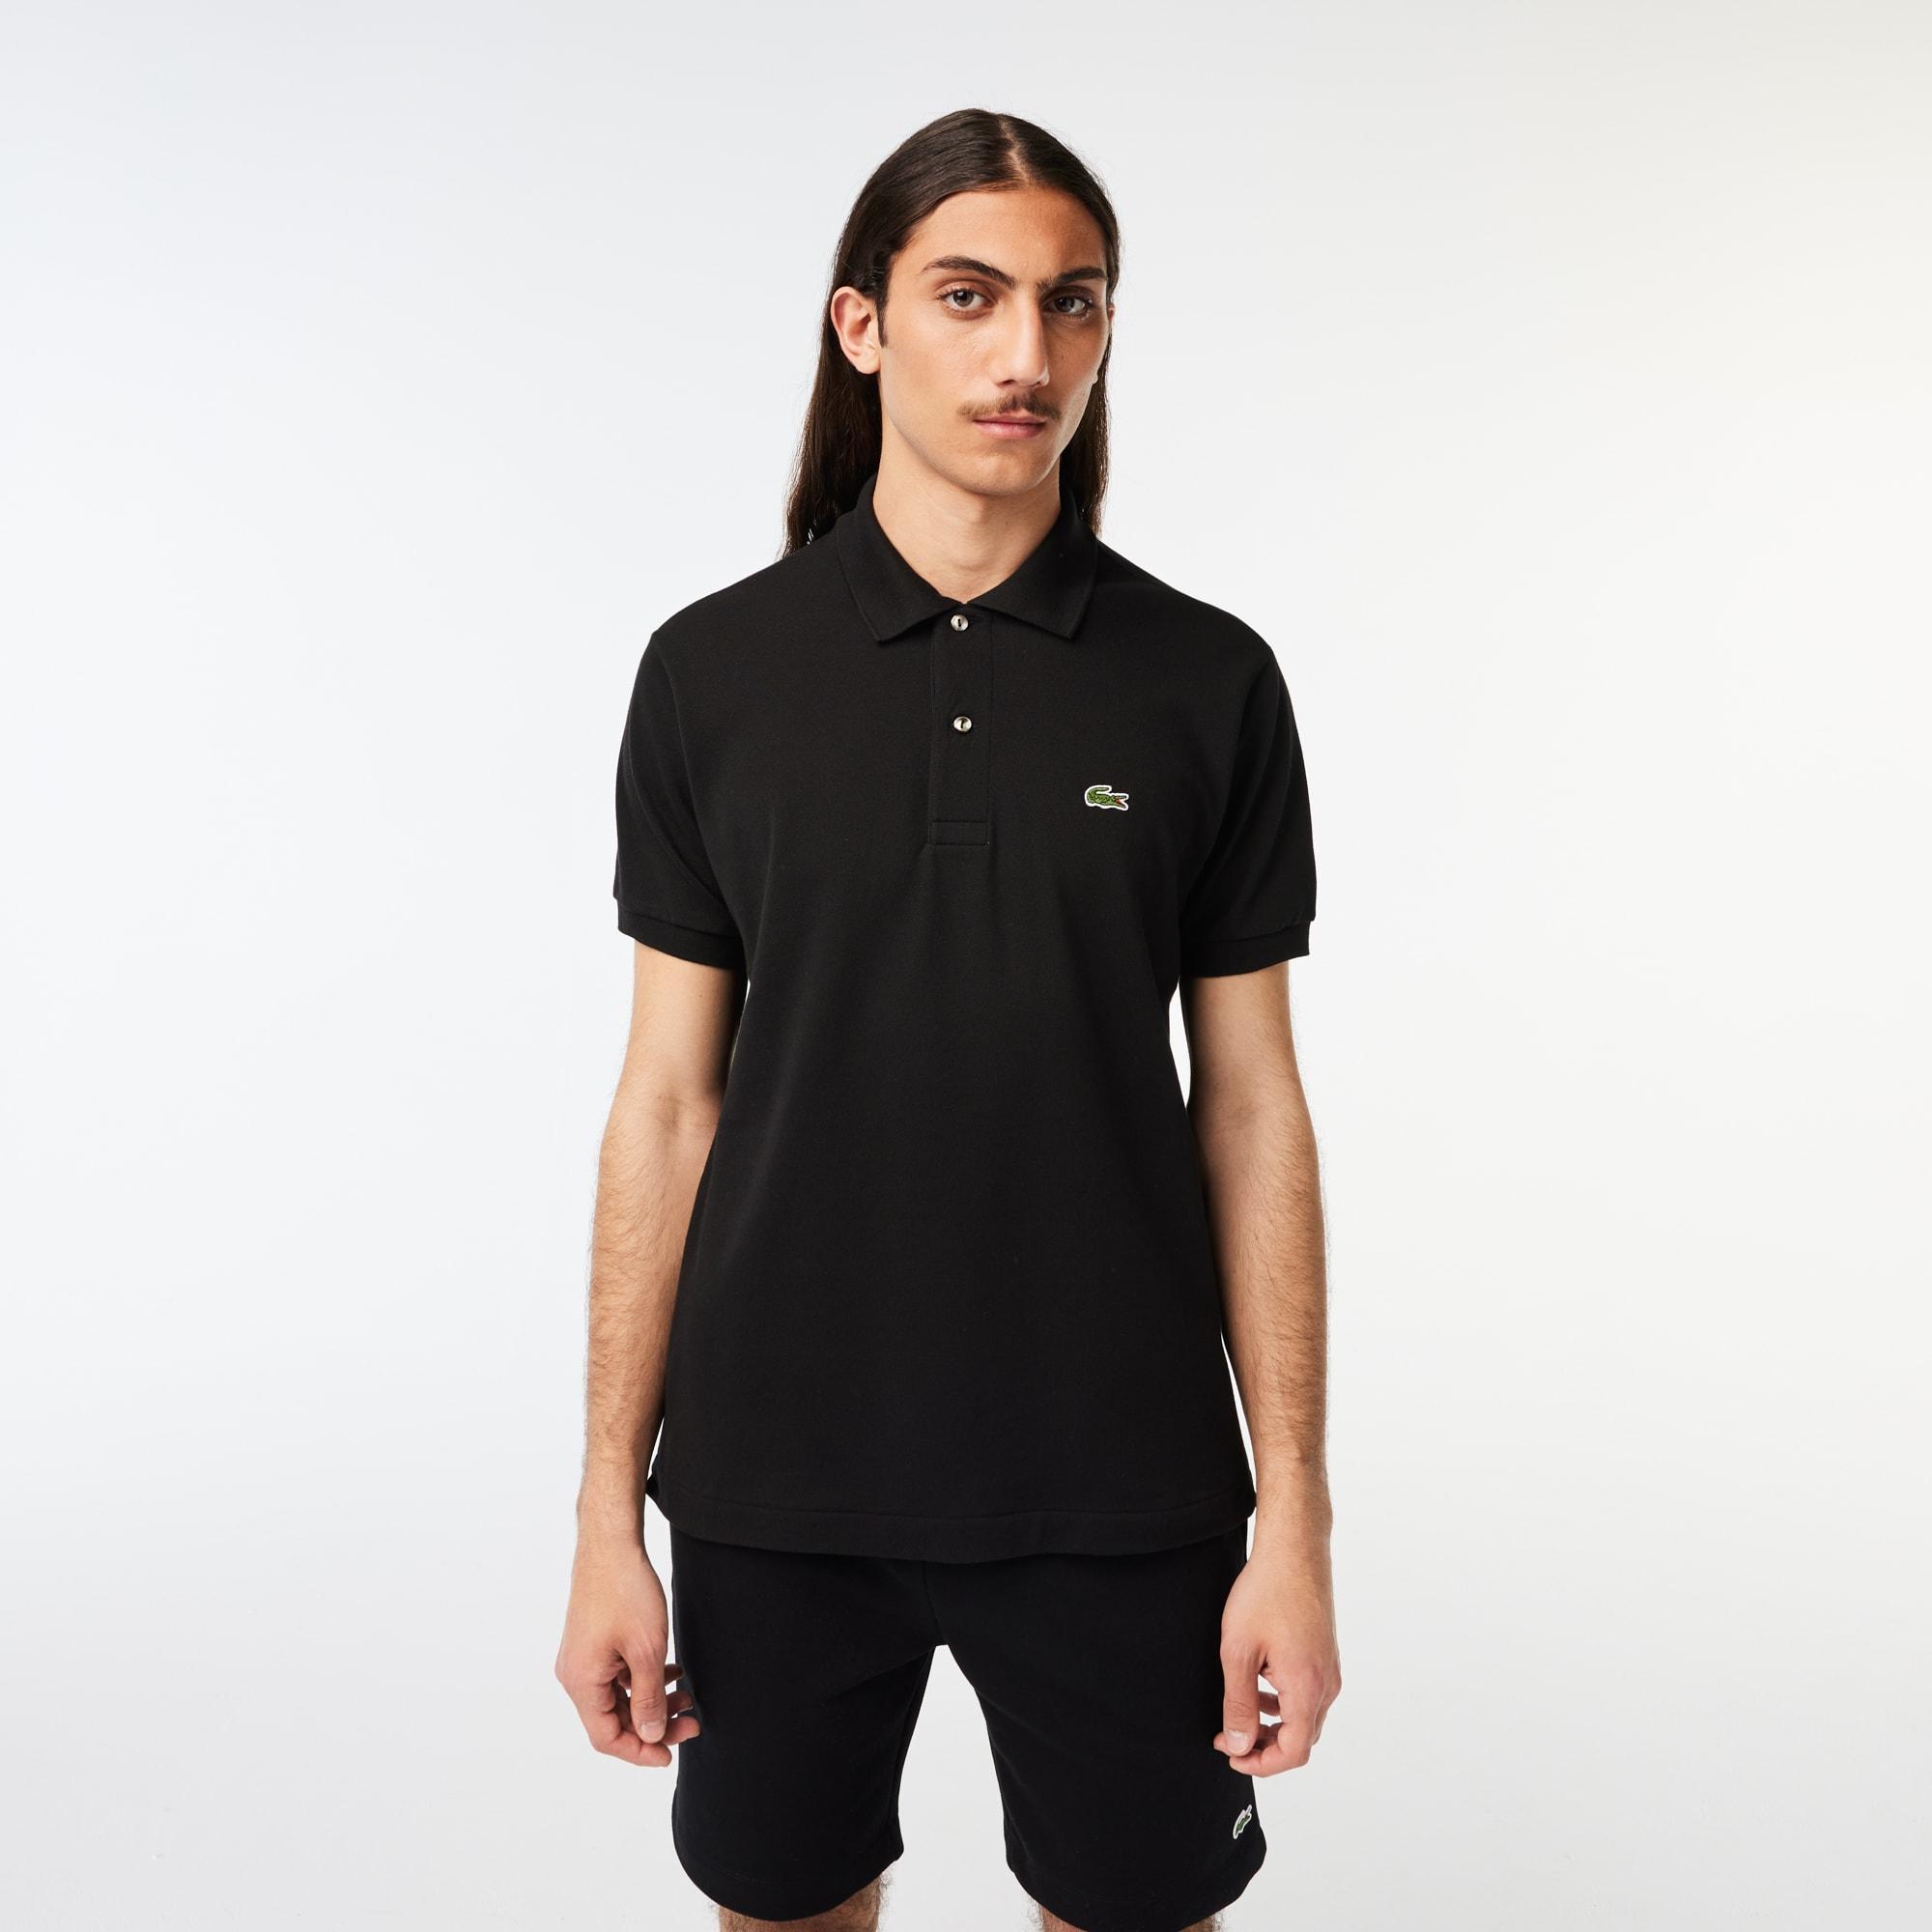 Camisas polo de manga curta  3163bca3174db